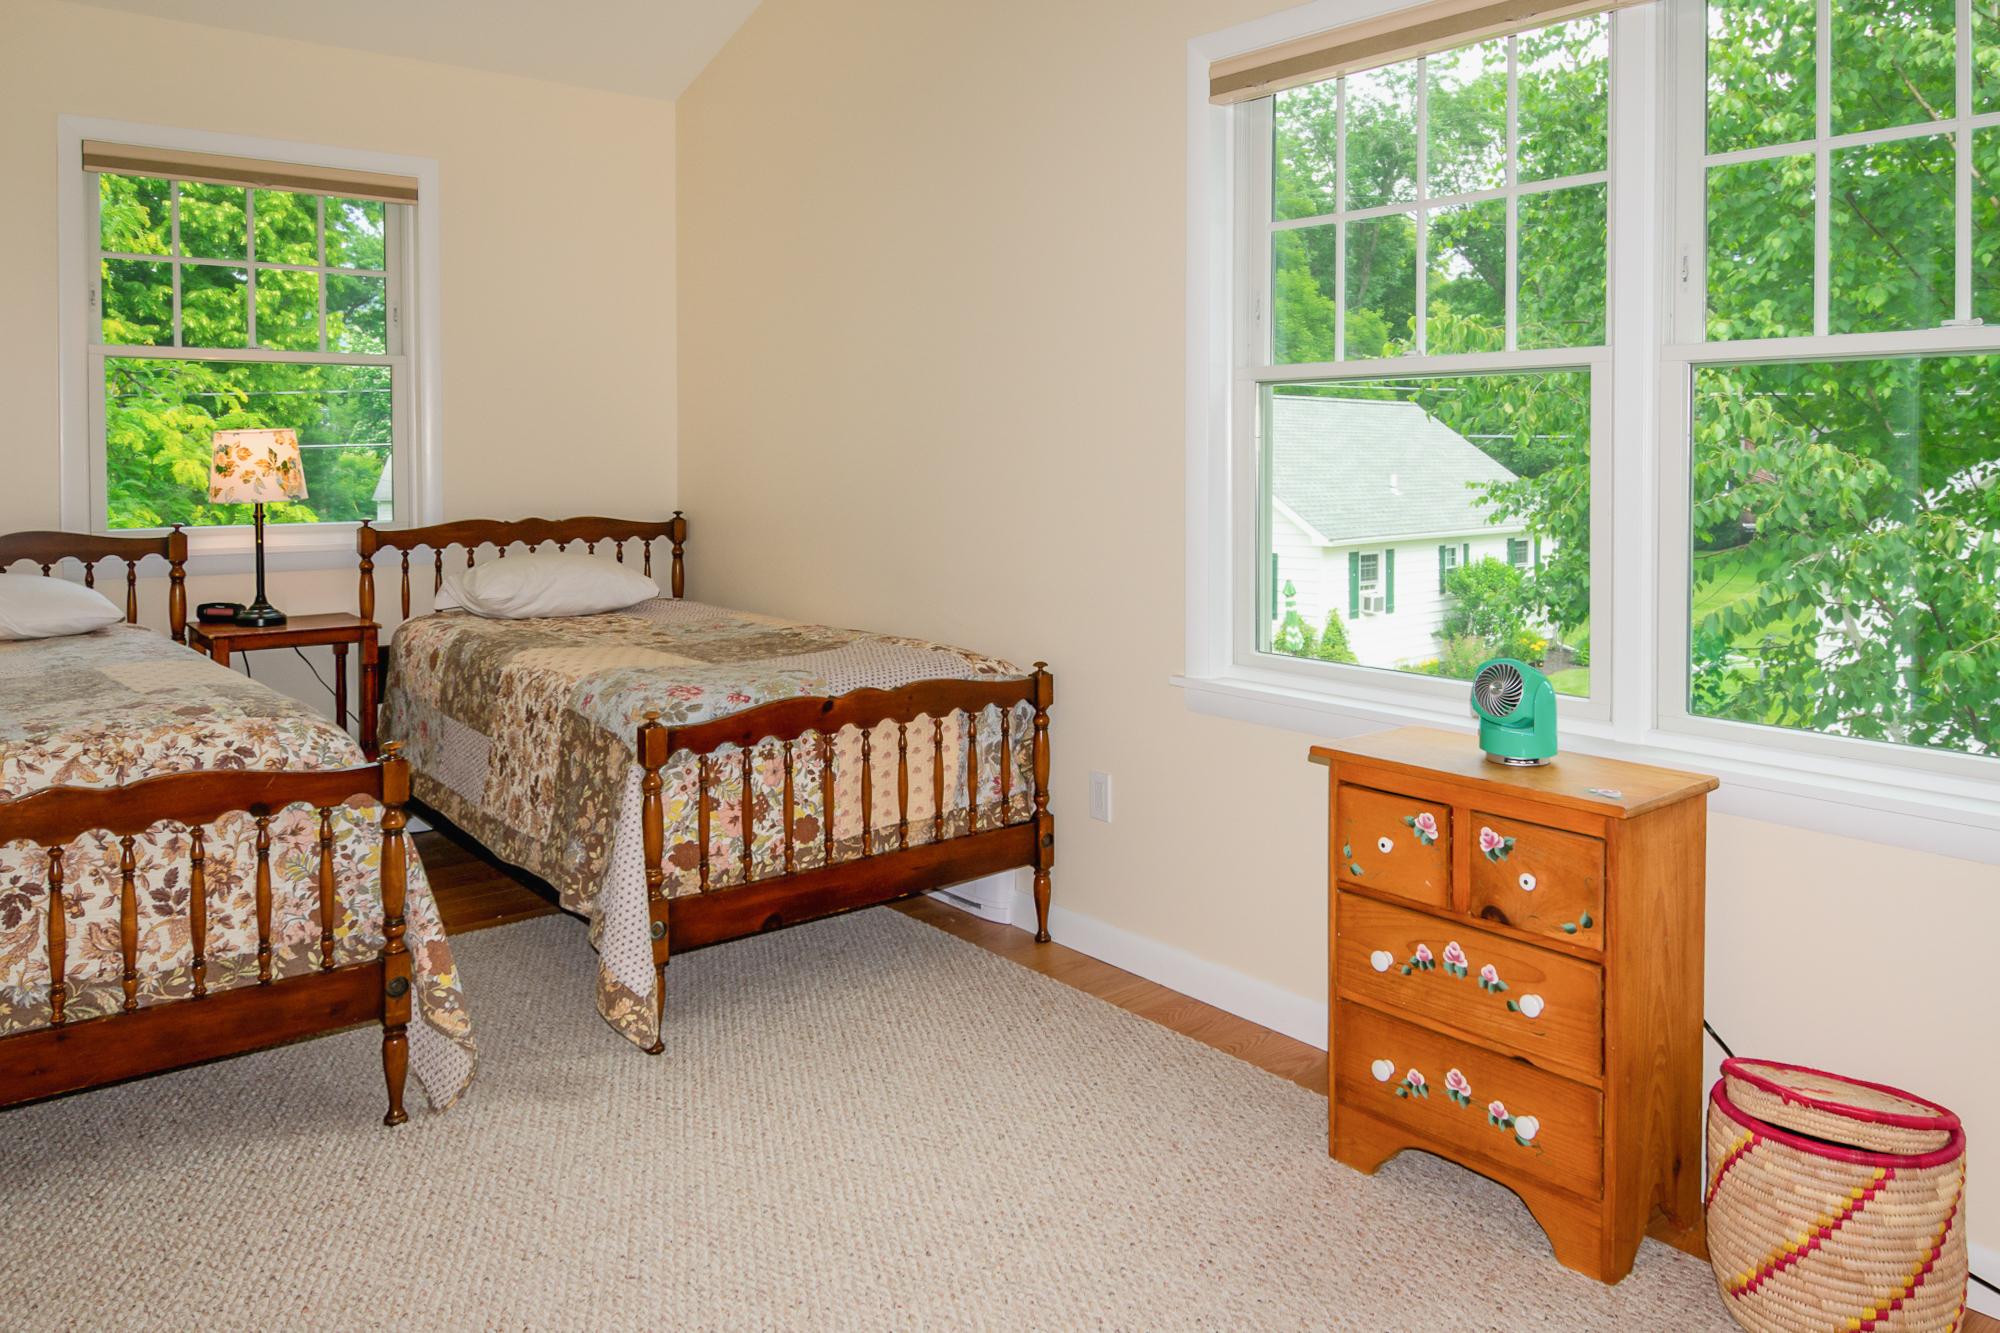 Takundewide Cottage #13 upstairs twin bedroom #2